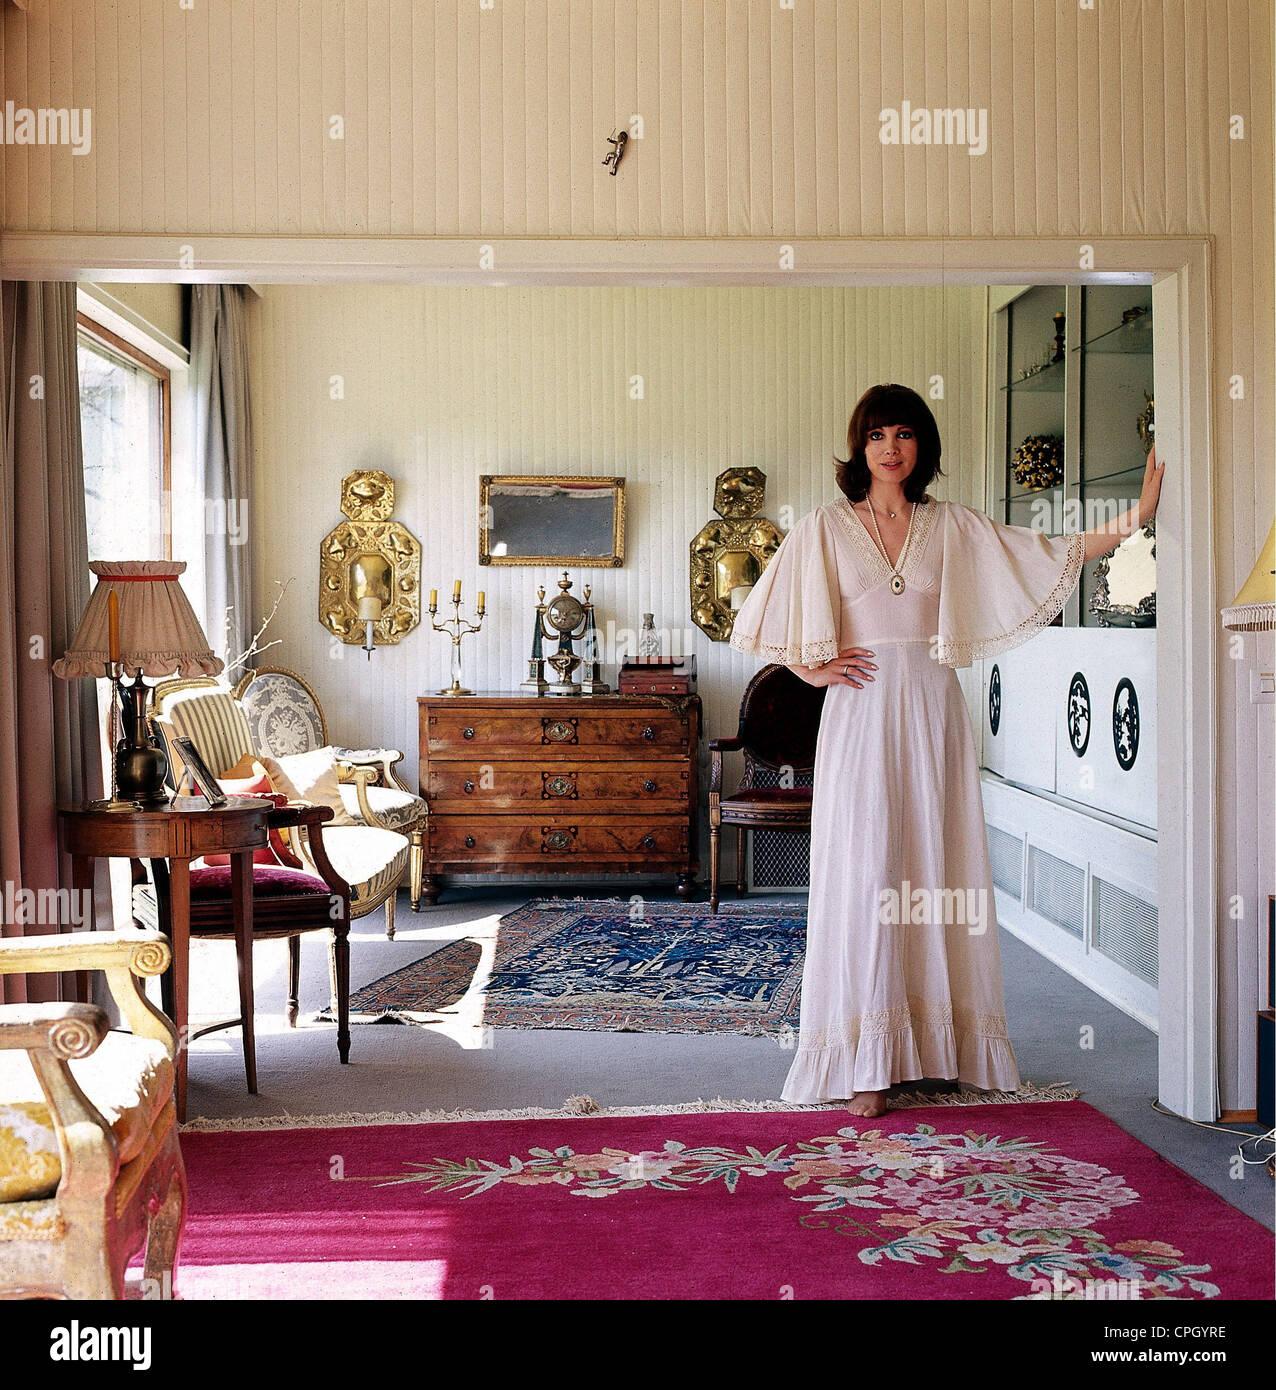 Schuermann, Petra, 15.9.1935 - 13.1.2010, German actress, TV presenter, full length, at home, 1970s, Additional - Stock Image